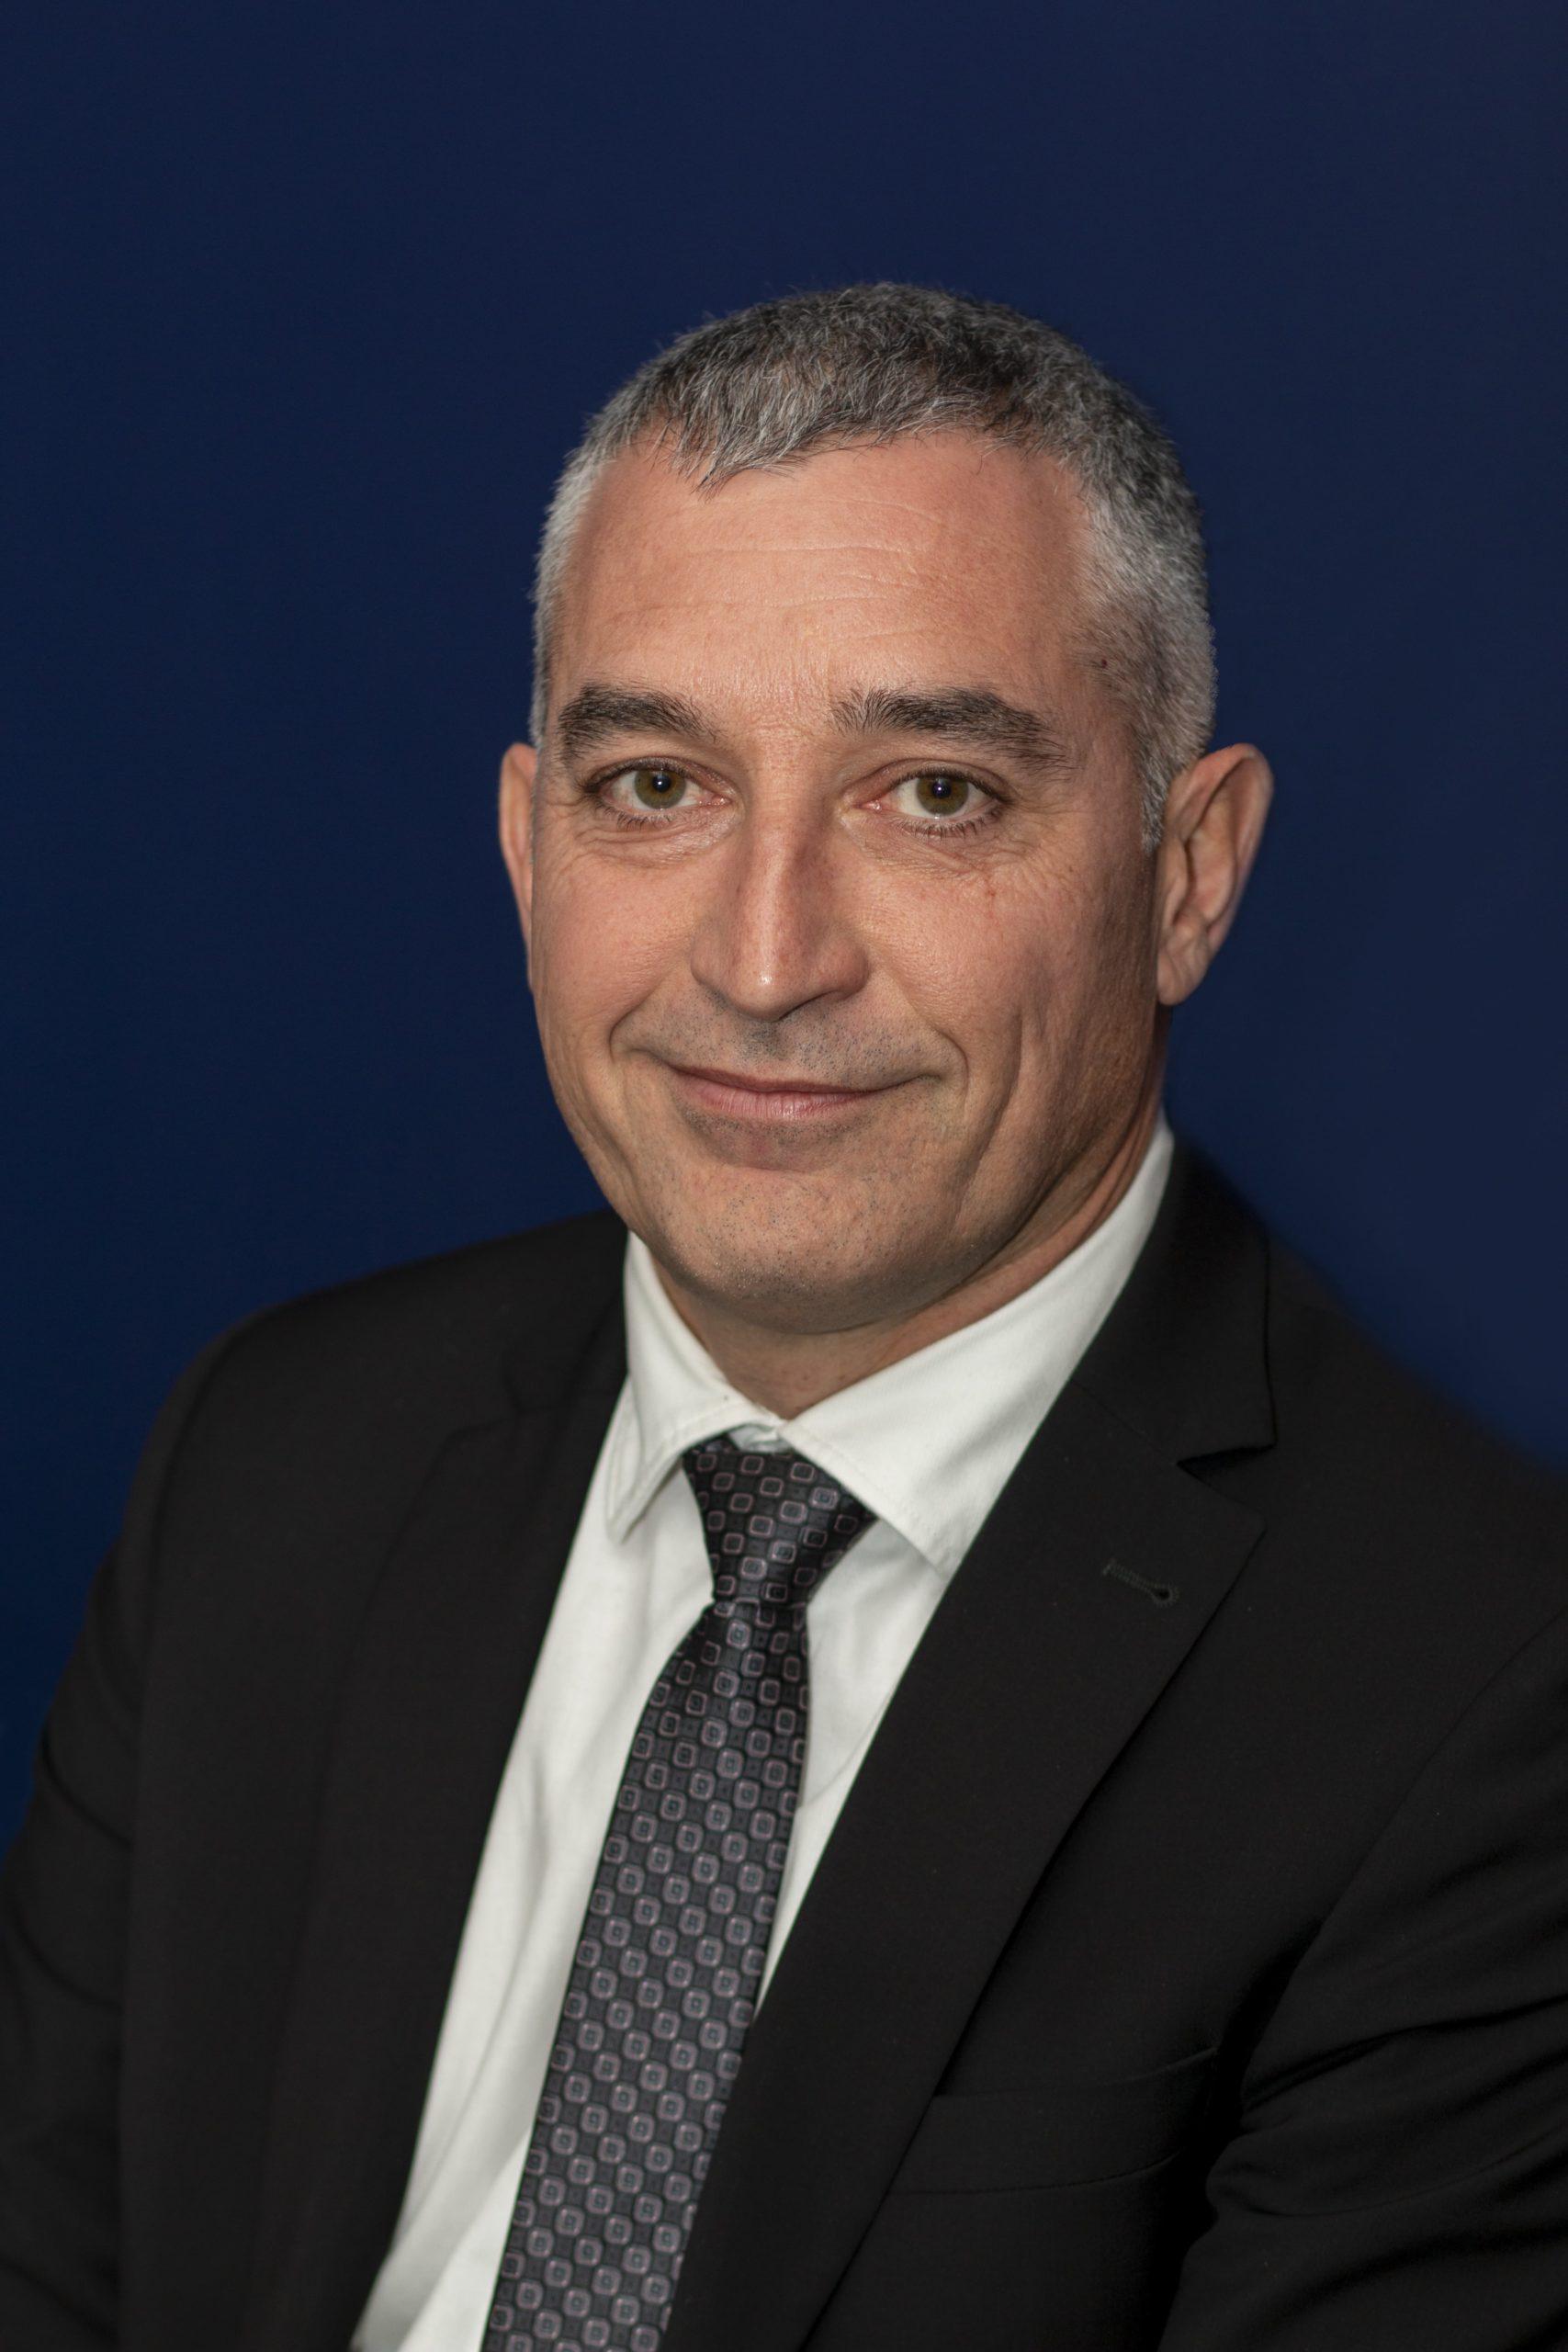 Franck Sorbara